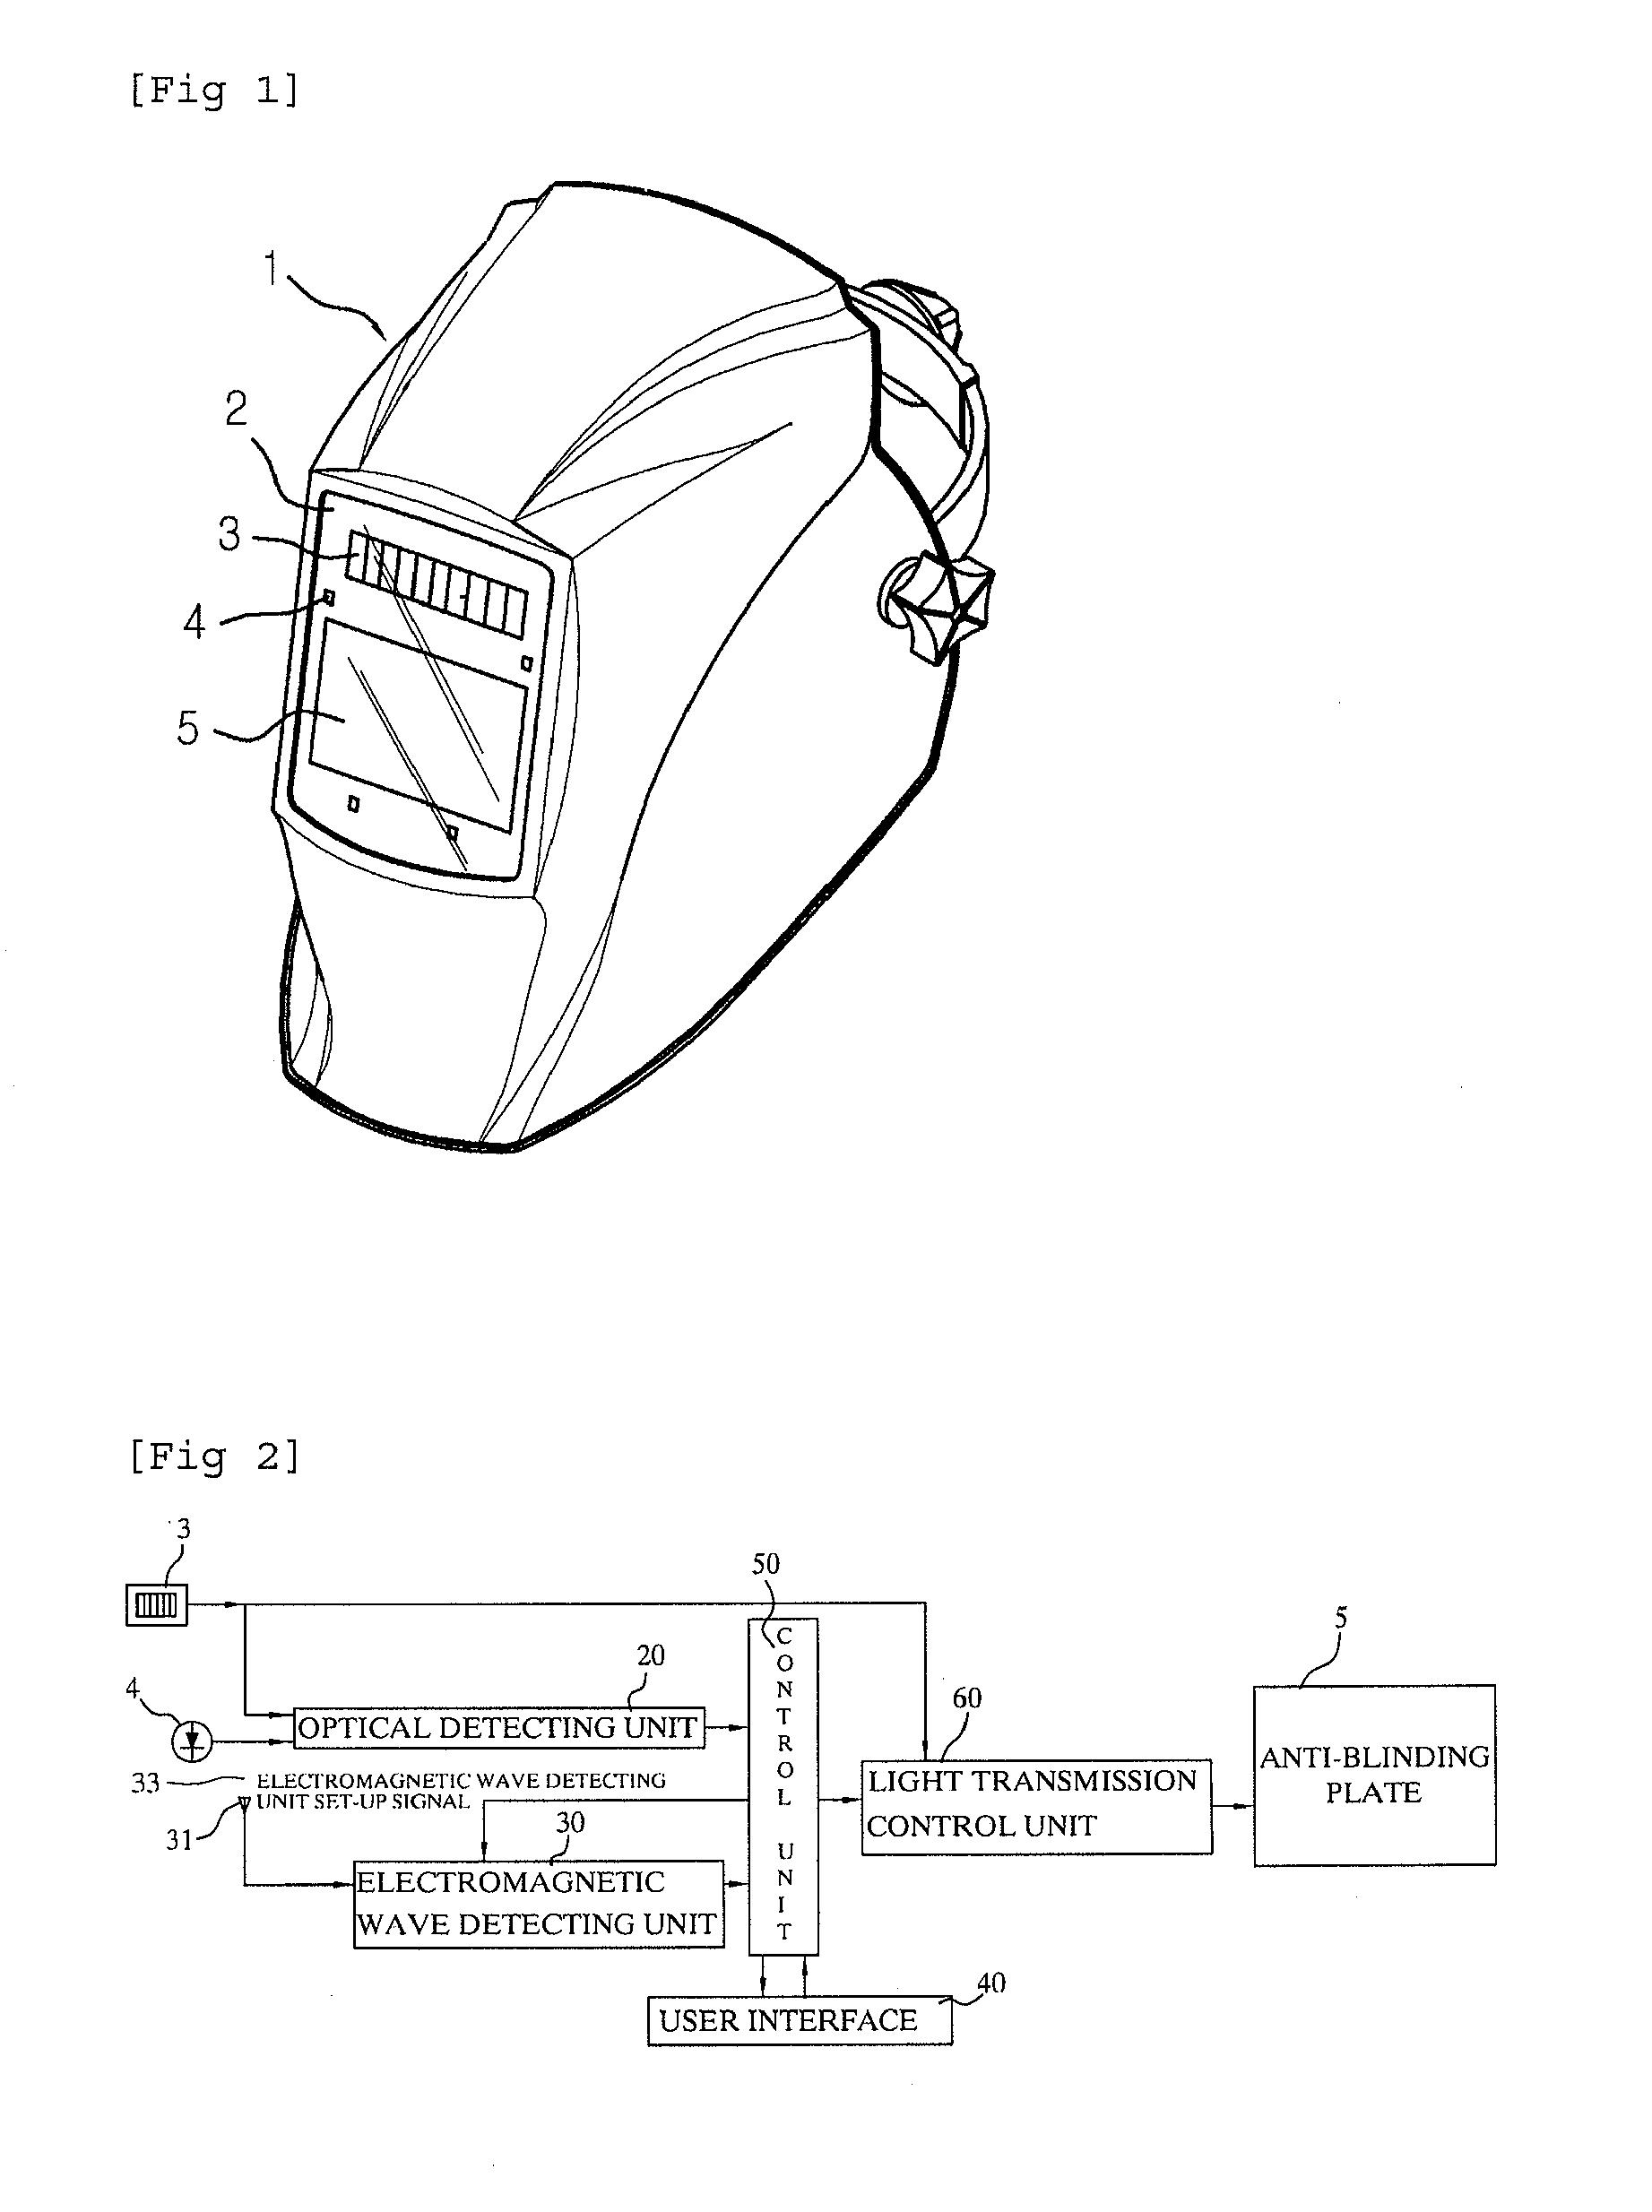 Welding shield diagram blueraritan info on diy welding table welding helmet frame for patent epa welding